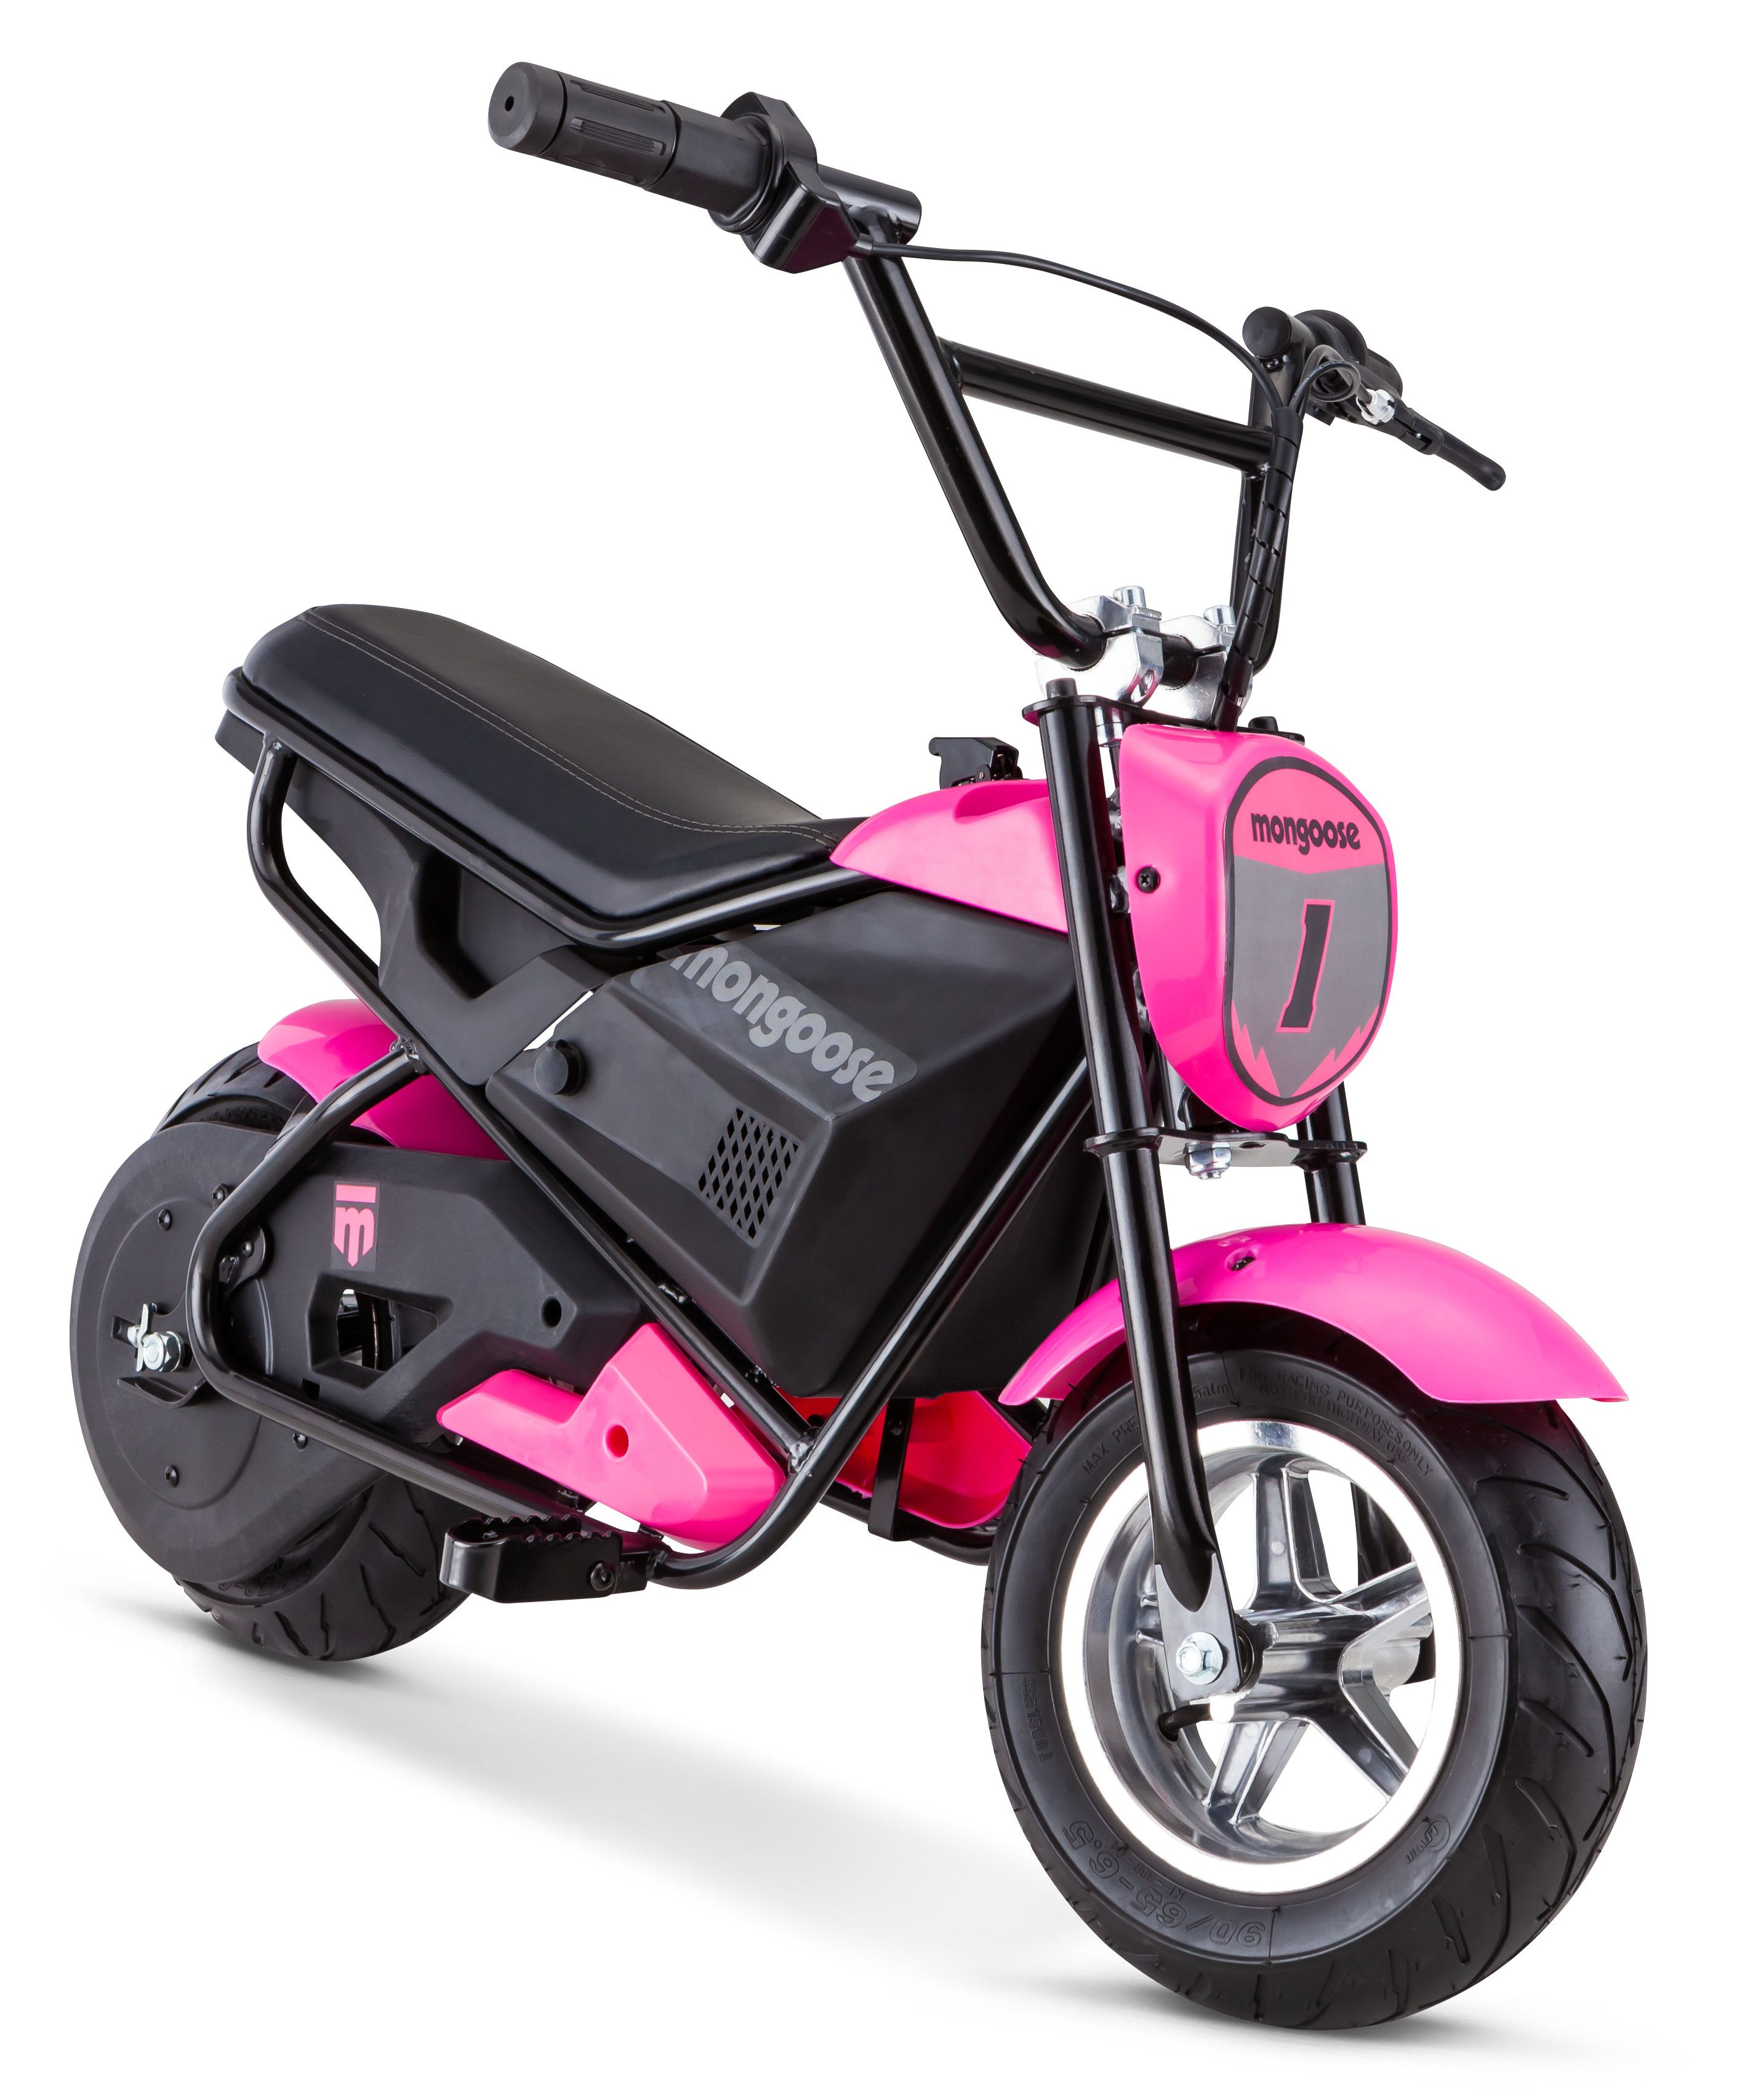 medium resolution of mongoose 24 volt powered mini bike pink hondaelectricscooter electricbikeforkids tvsbike jawabike